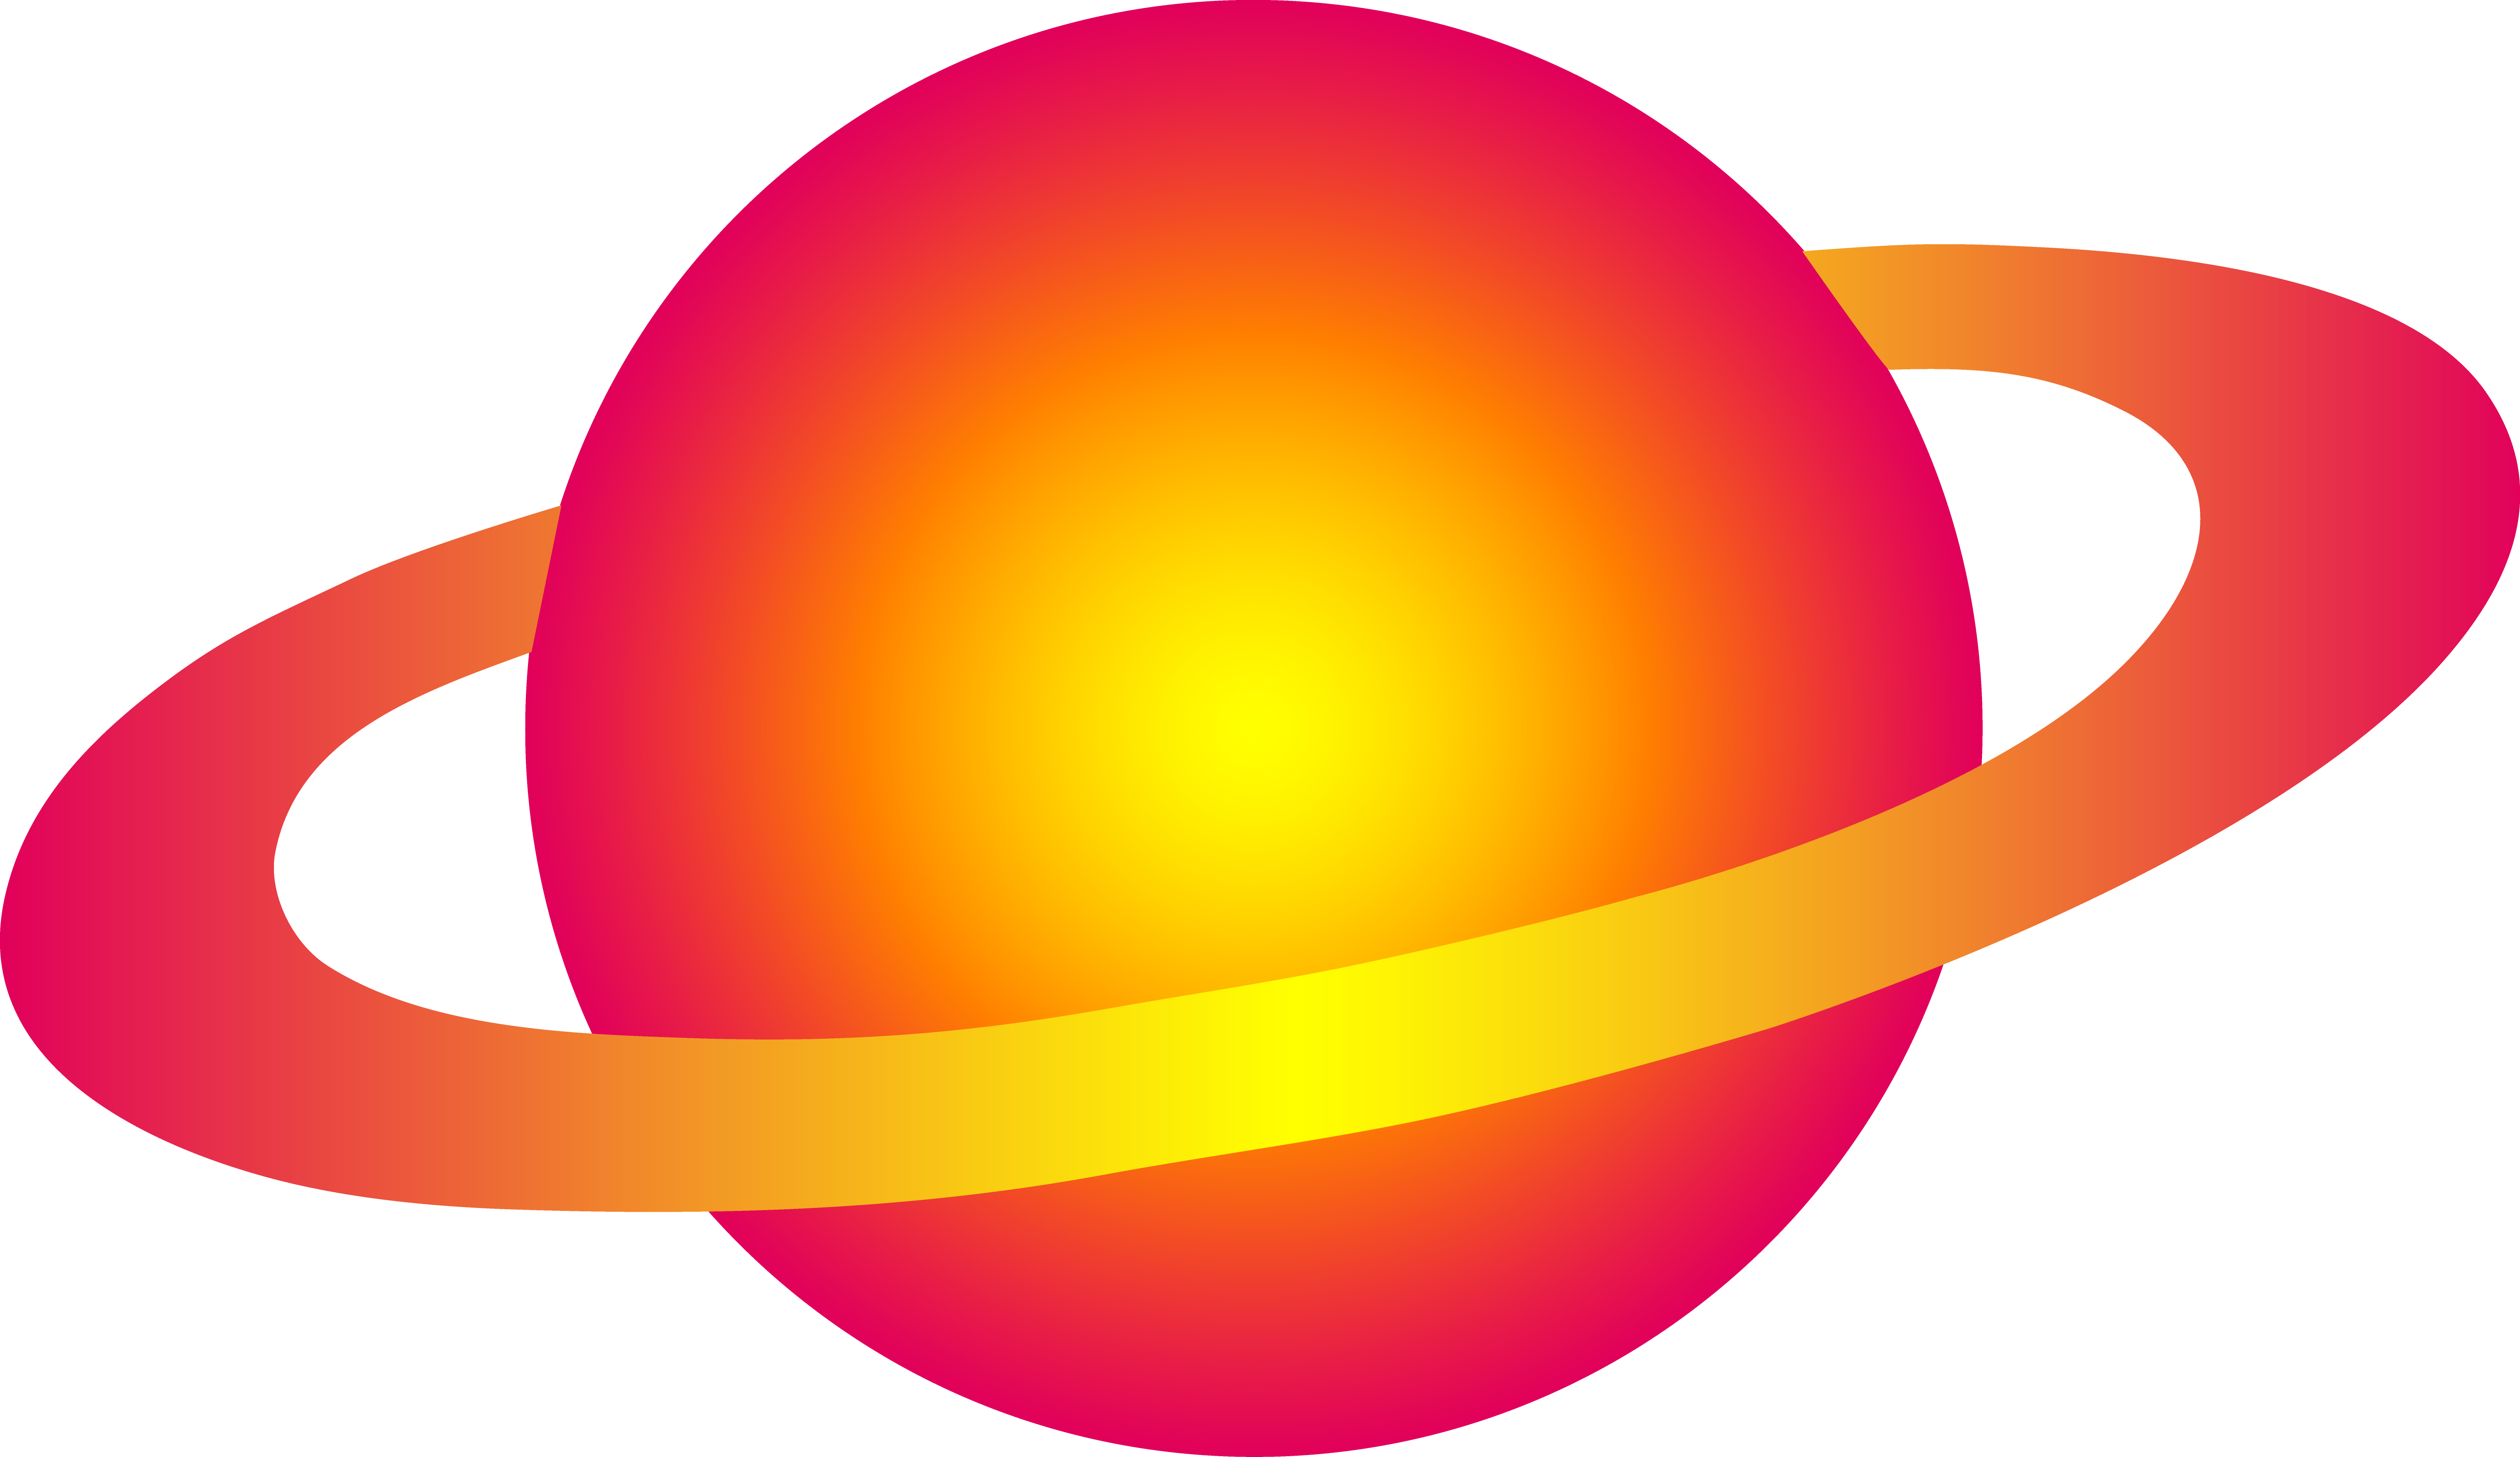 Saturn Clip Art - Cliparts.co